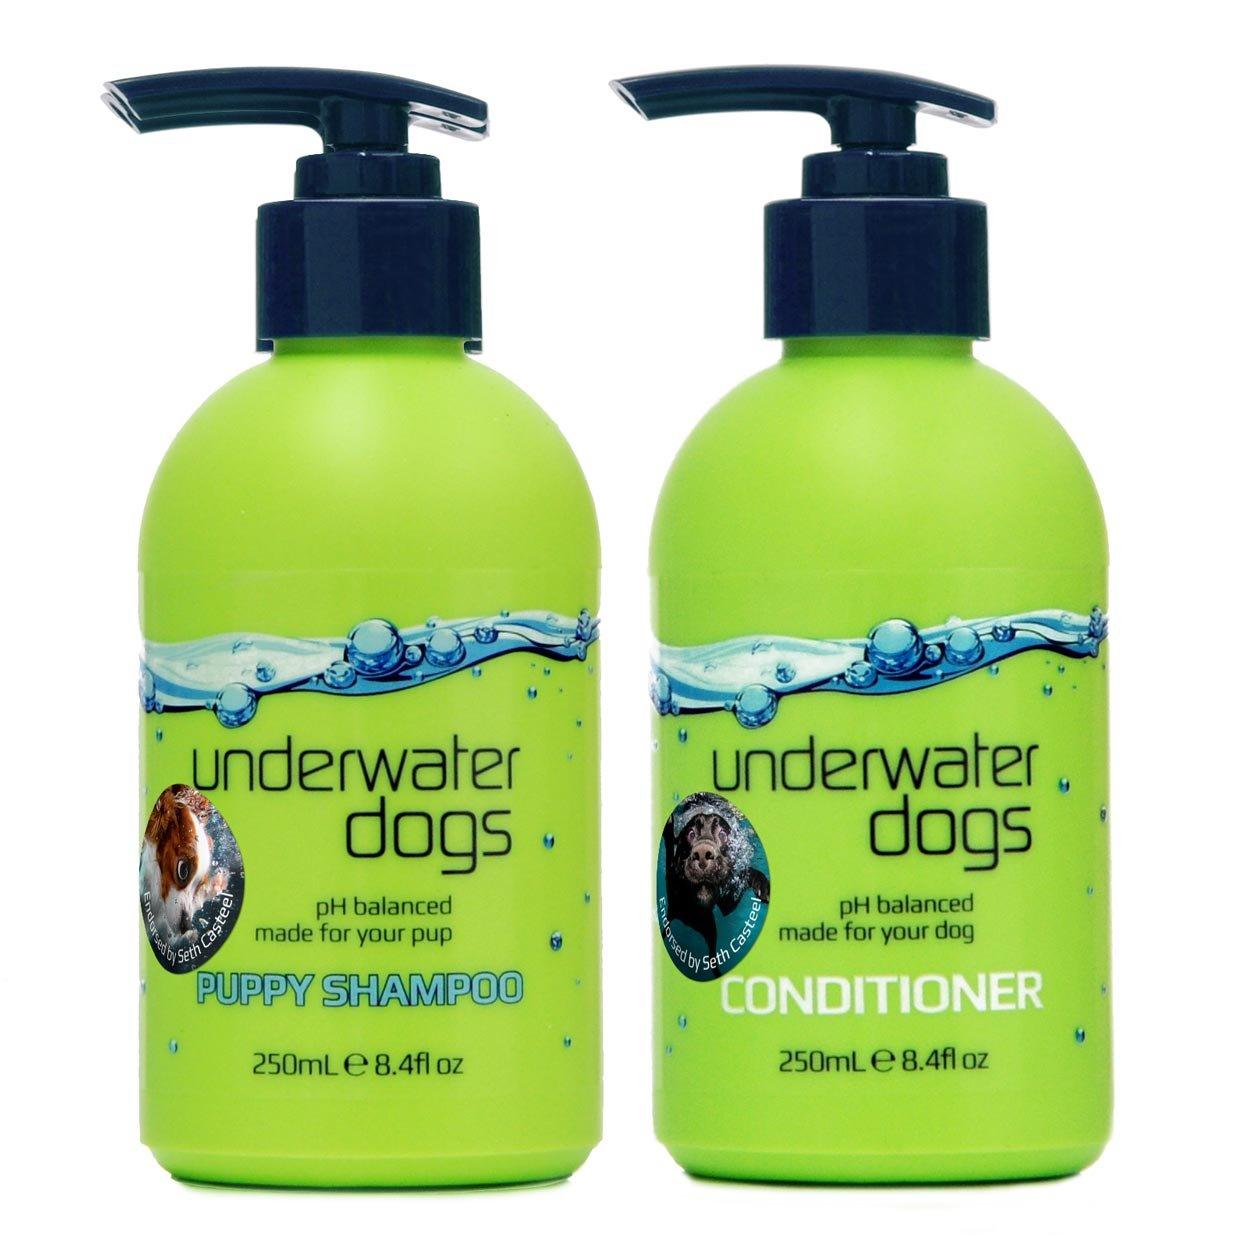 Underwater Dogs - Moisturizing Puppy Shampoo & Conditioner for Dry Skin - 8.4 fl. oz. Vanilla-Coconut